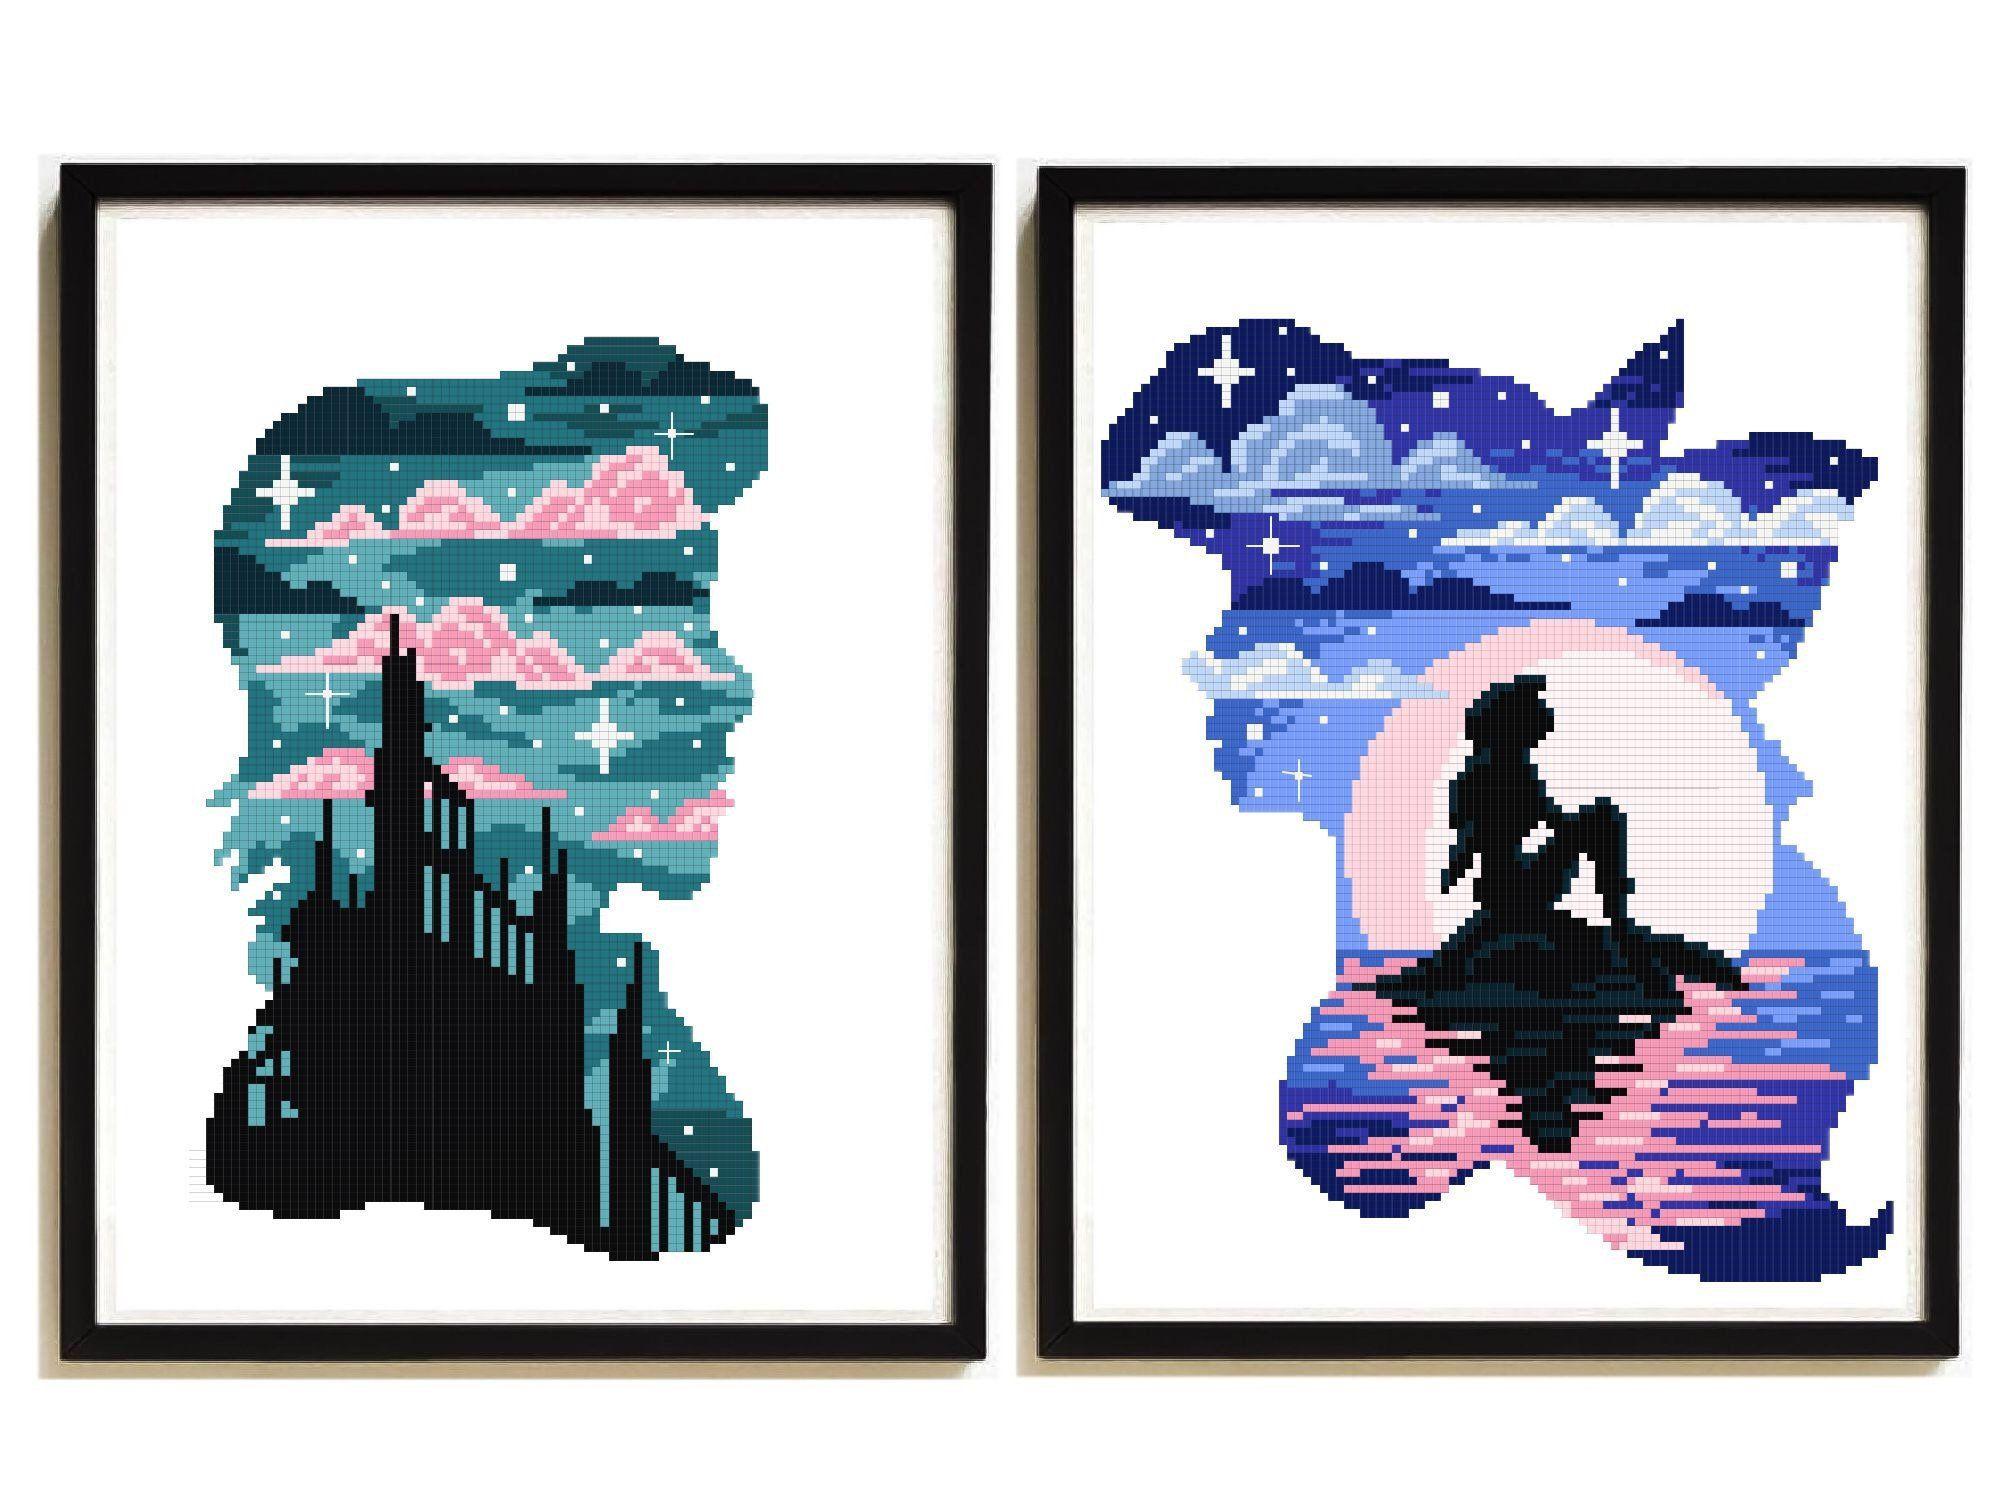 ariel disney modern cross stitch pattern, little mermaid disney princess,  castle counted cross stitch chart, baby, nursery decor,